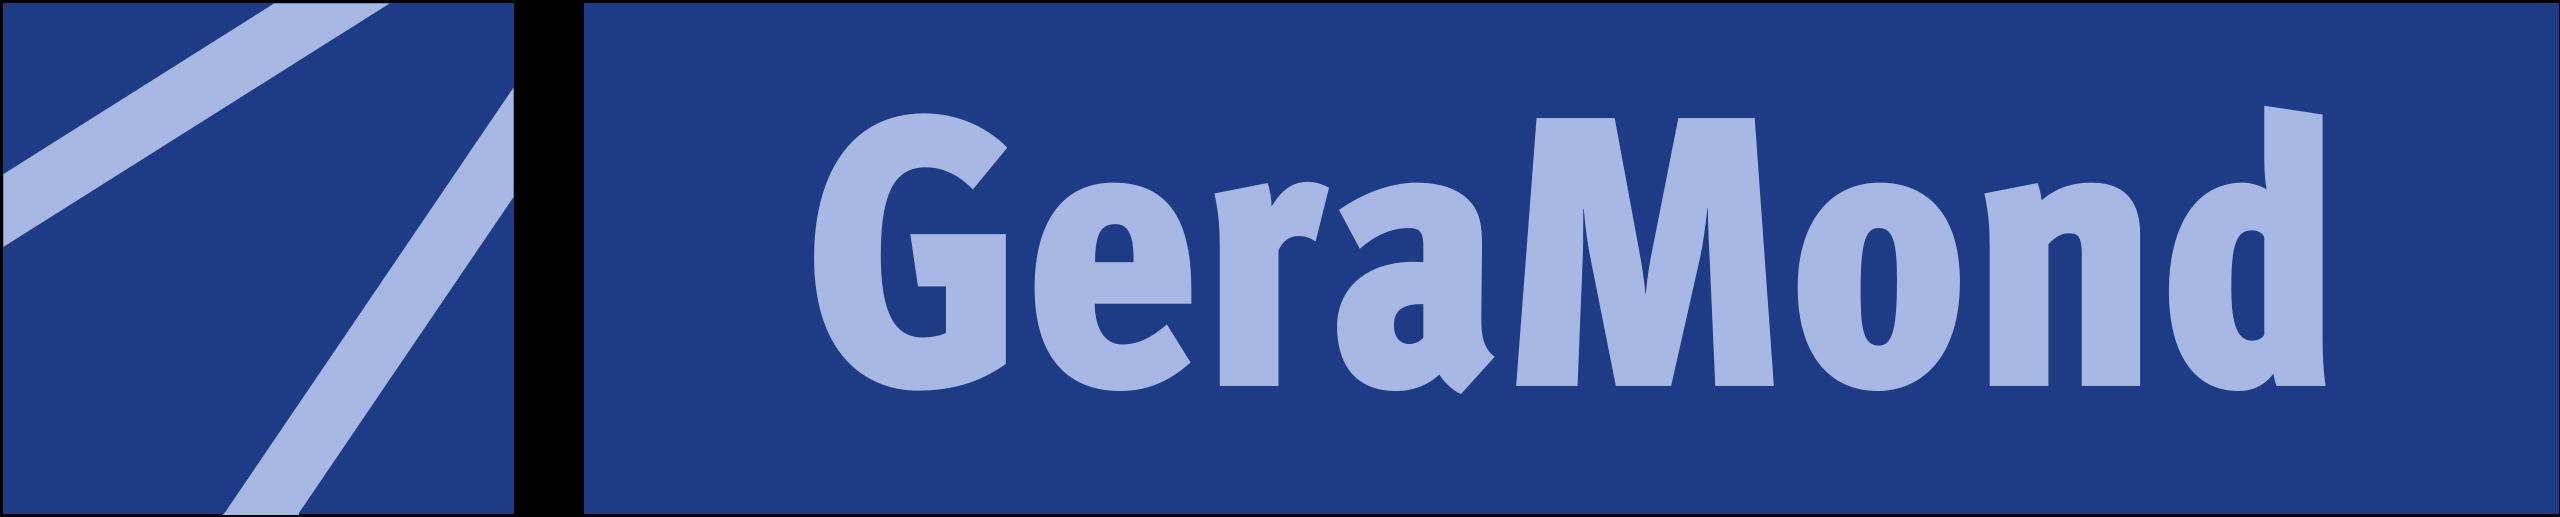 Geramond Verlag